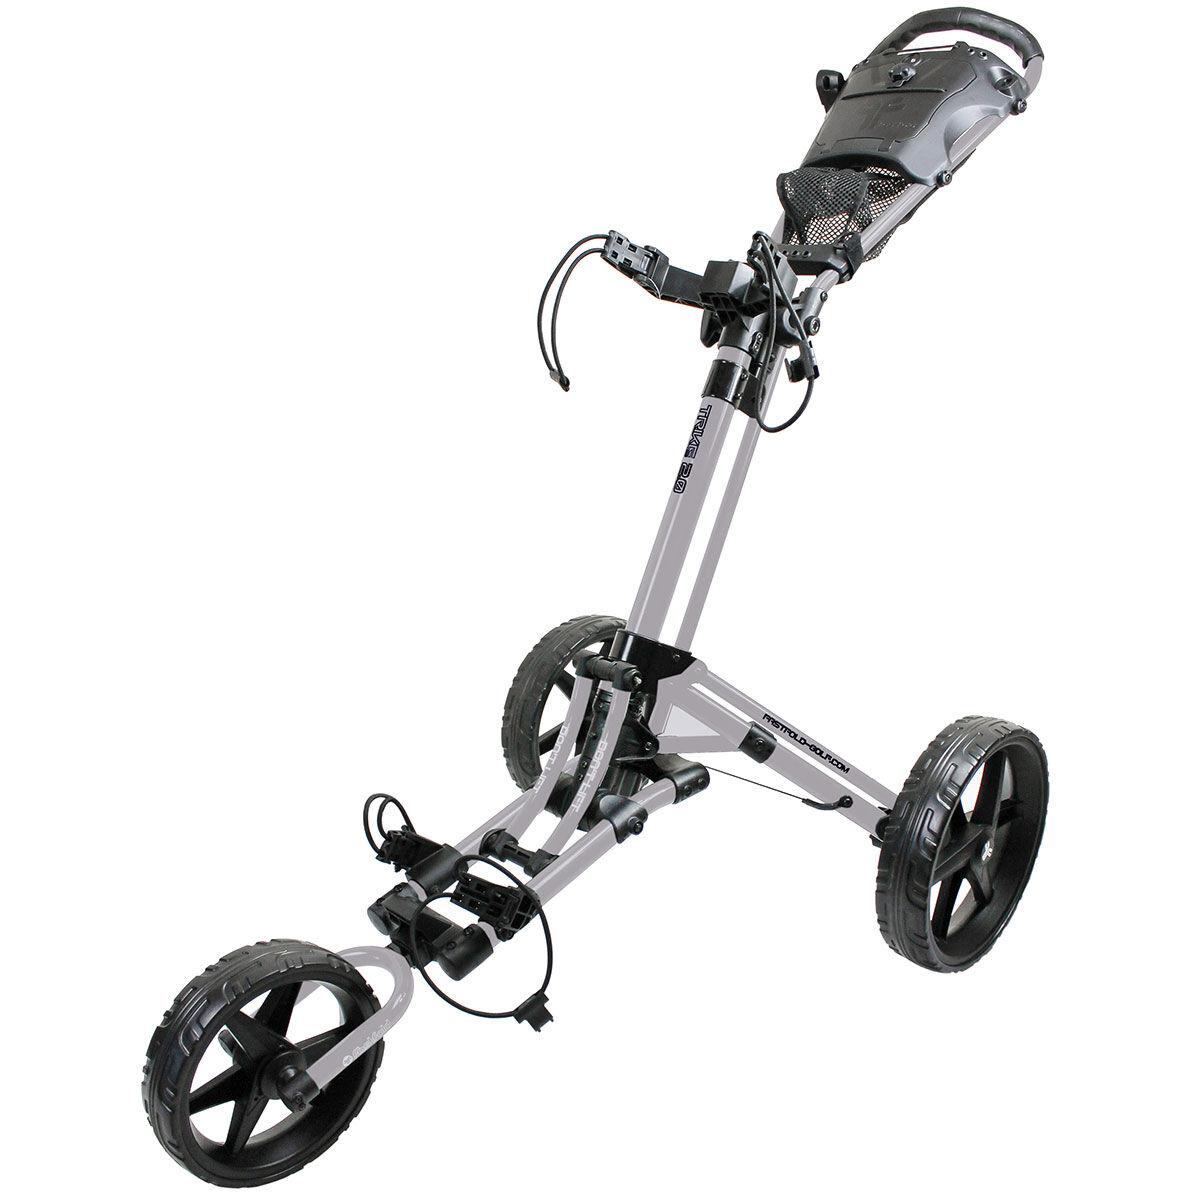 Fast Fold Mens Silver And Black Lightweight FastFold Trike 2.0 Golf Trolley, One Size | American Golf